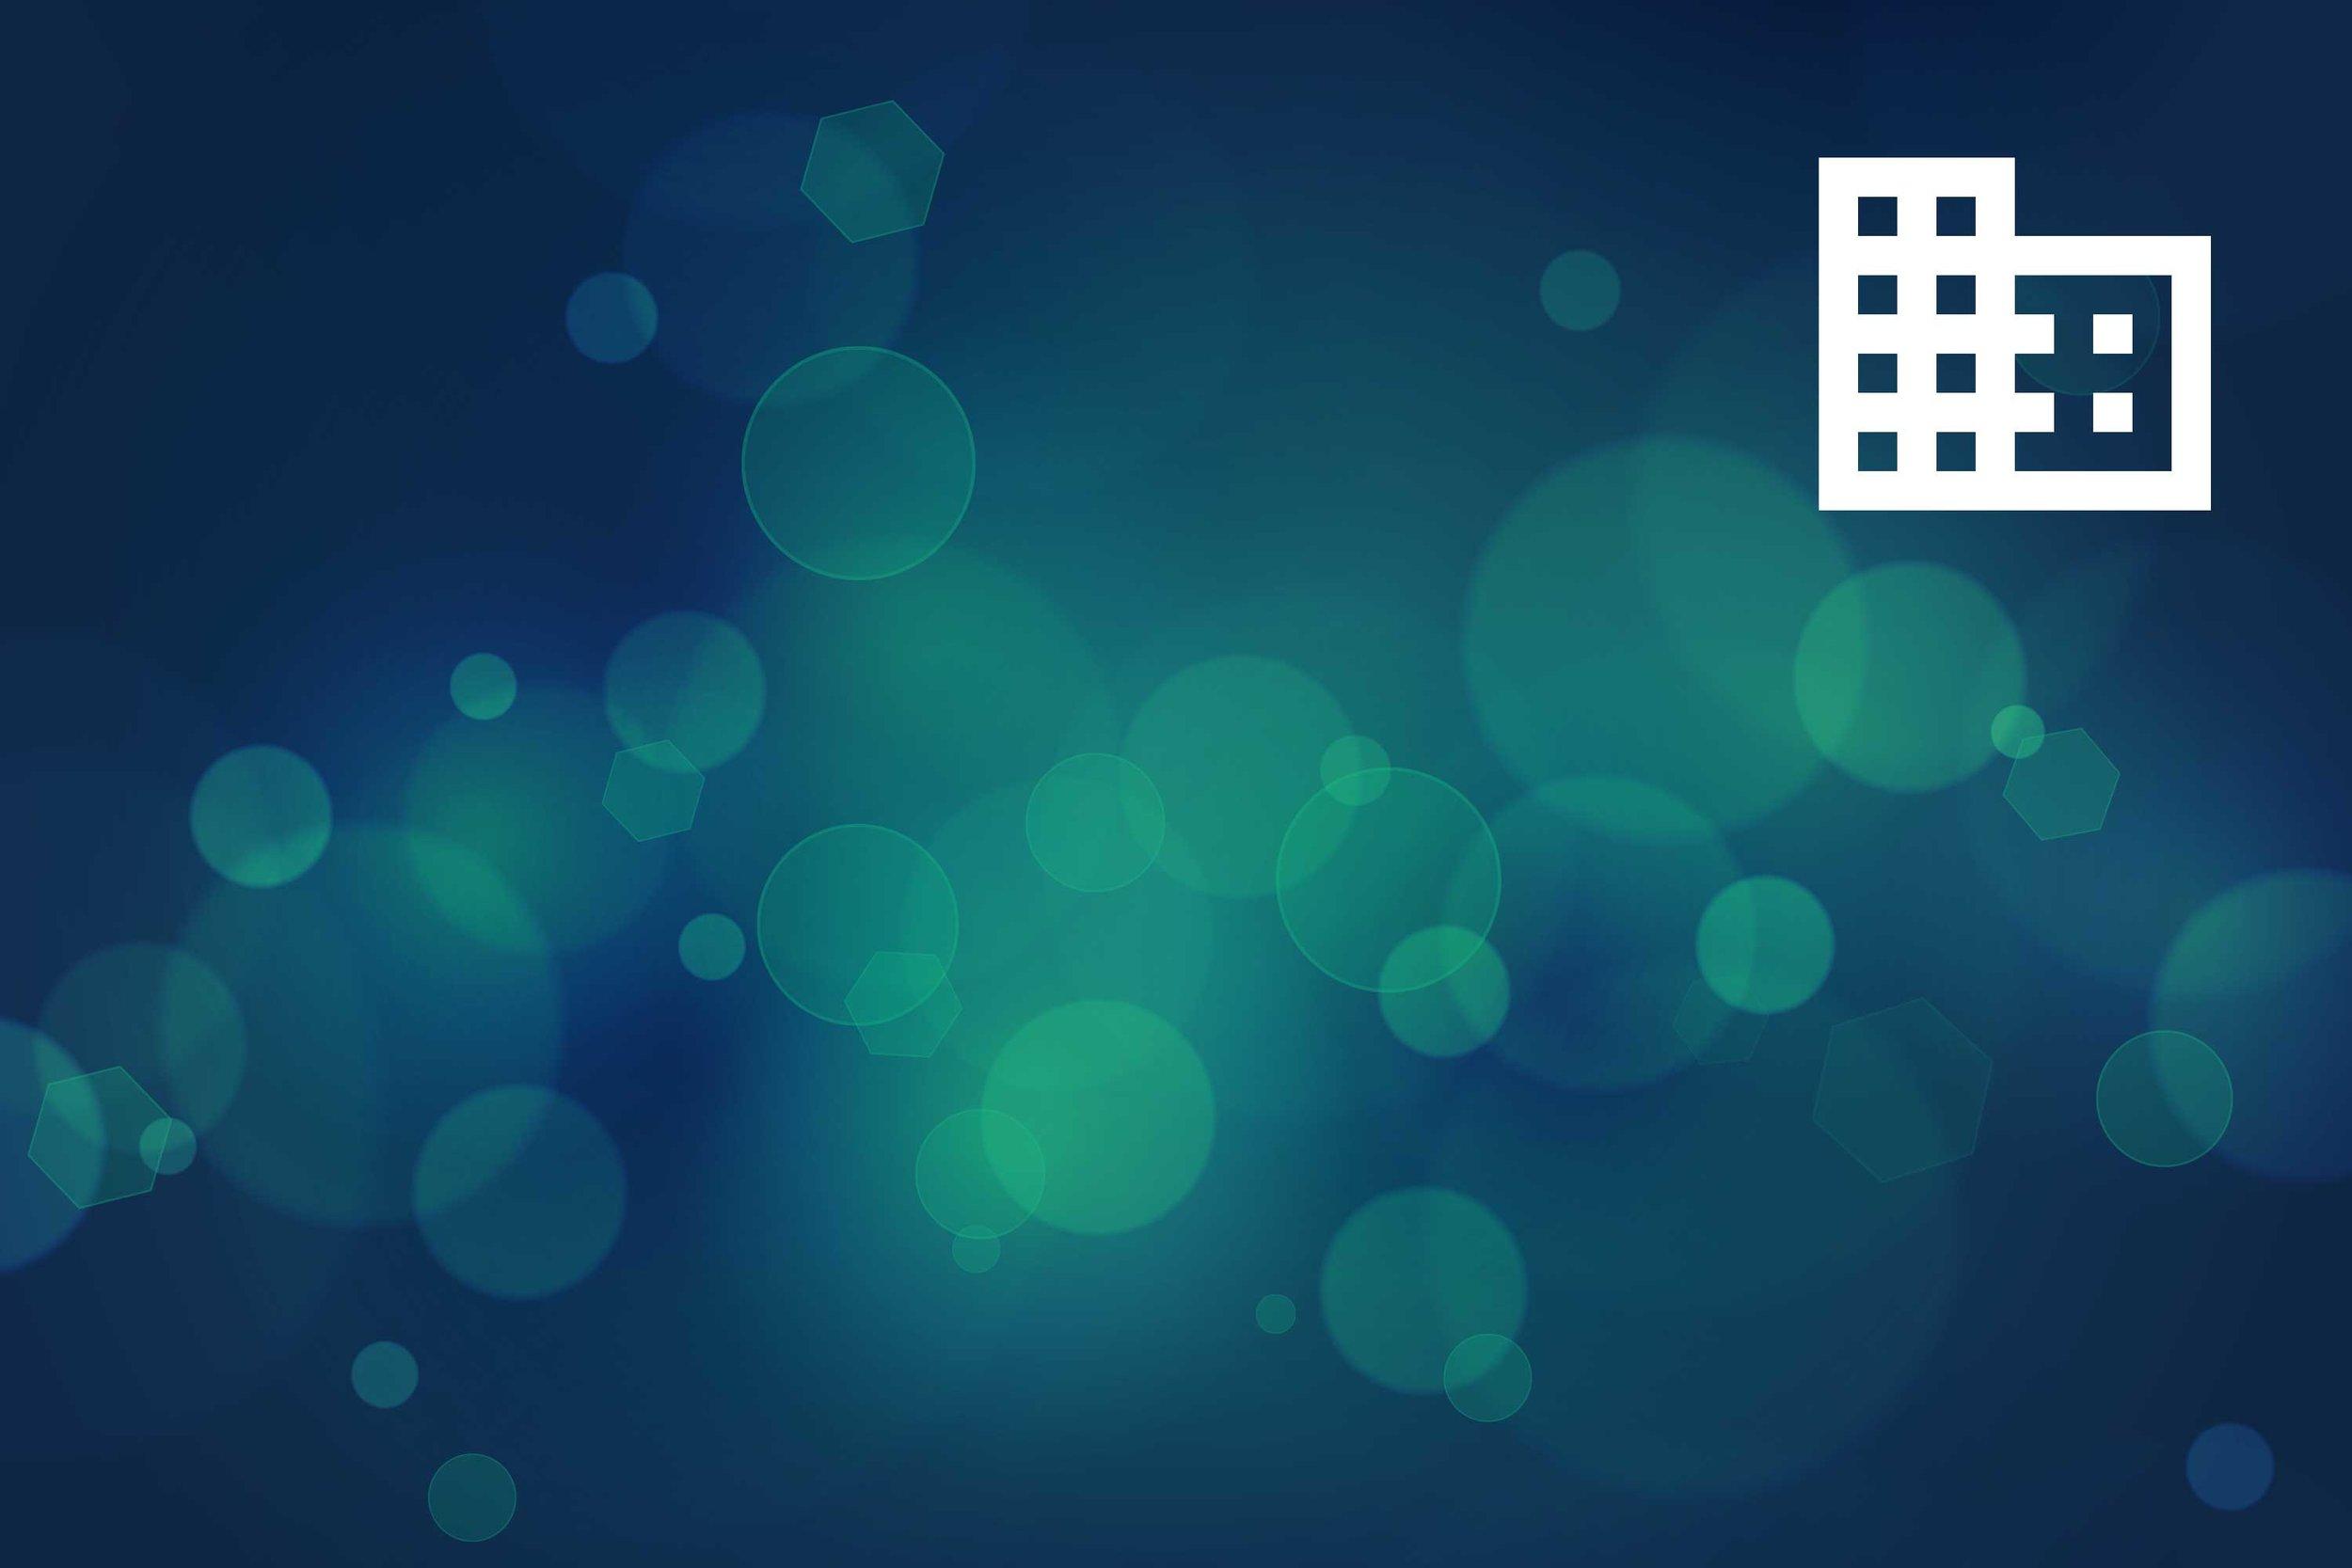 IT Services - Comprehensive IT Services & Solutions